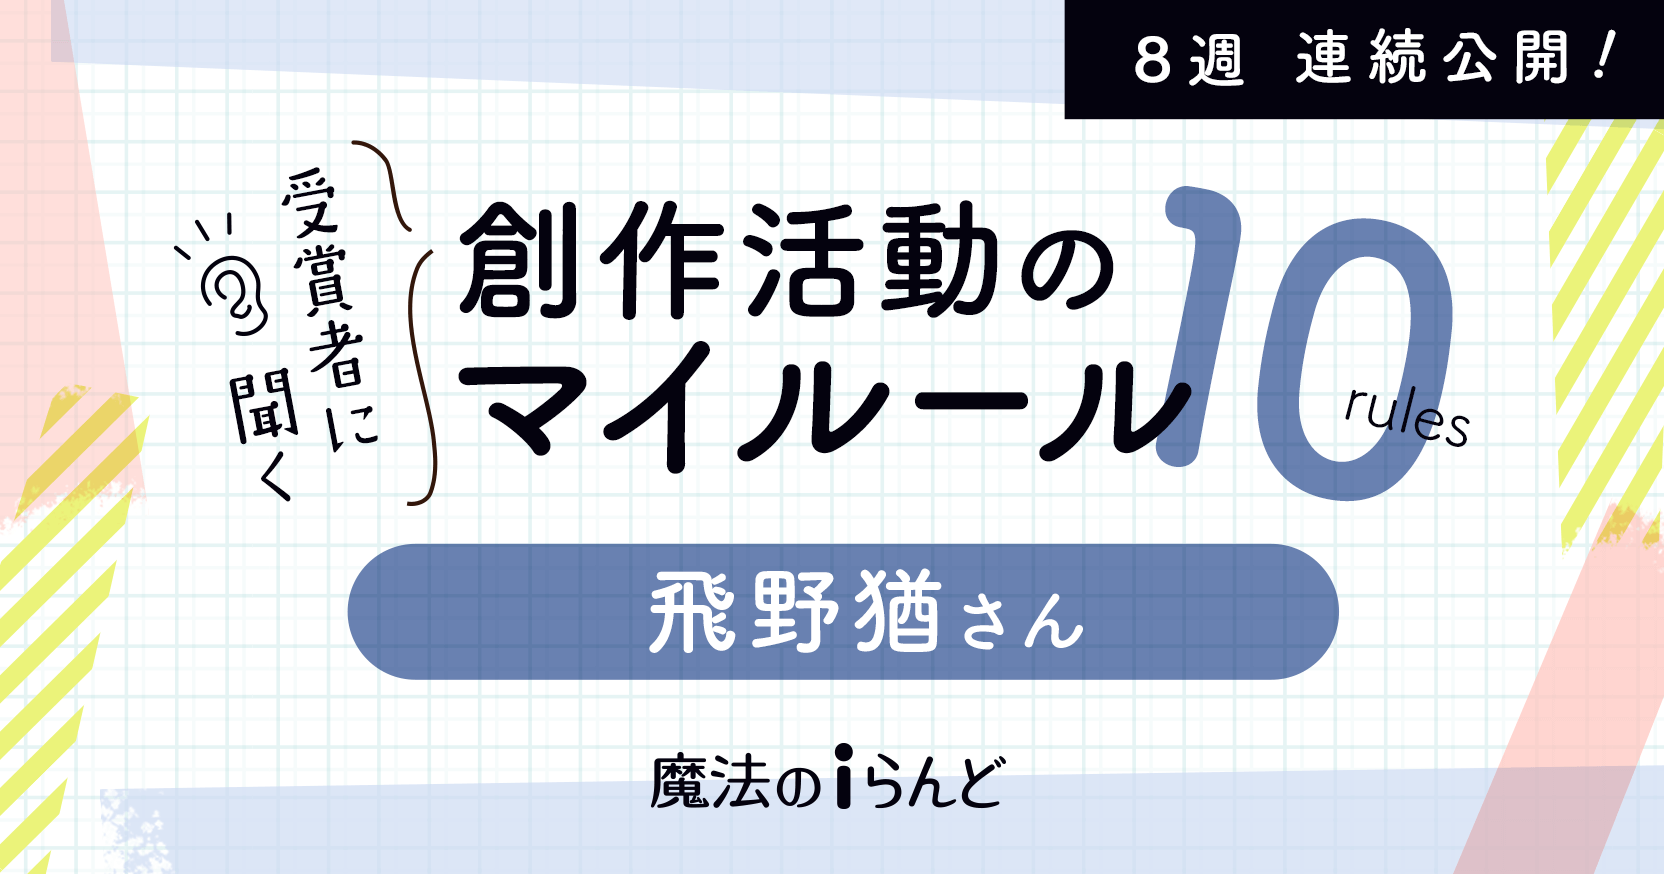 https://storage.googleapis.com/blog-info/entry/2021/08/05-myrule-tobino_ogp.png